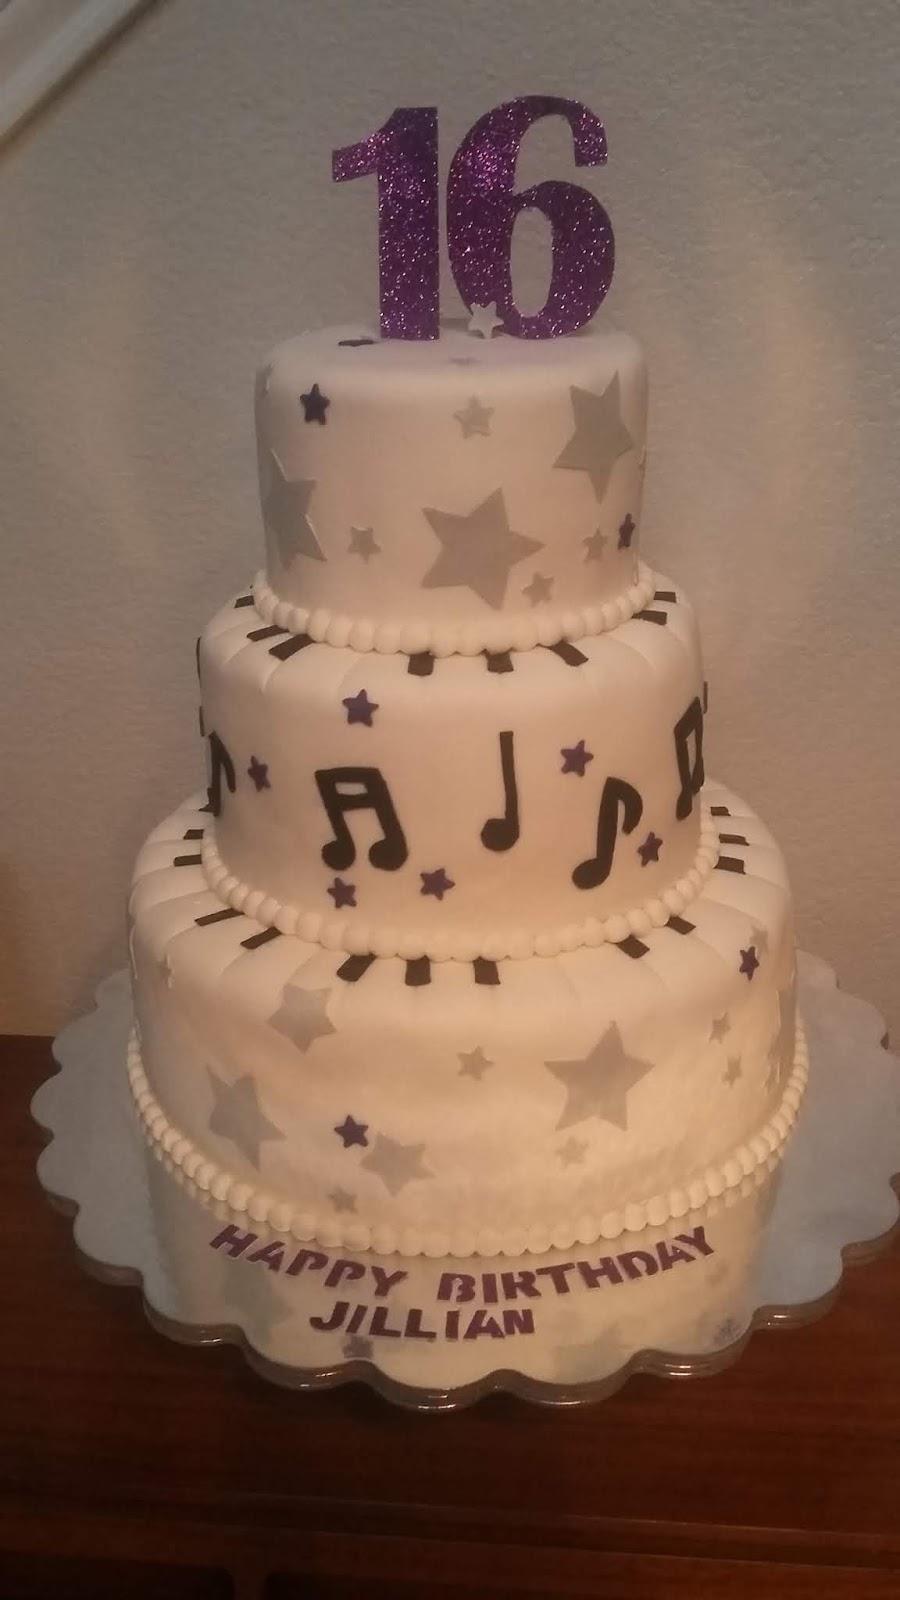 Swell My Cake Hobby Sweet 16 Music Themed Birthday Cake Funny Birthday Cards Online Alyptdamsfinfo